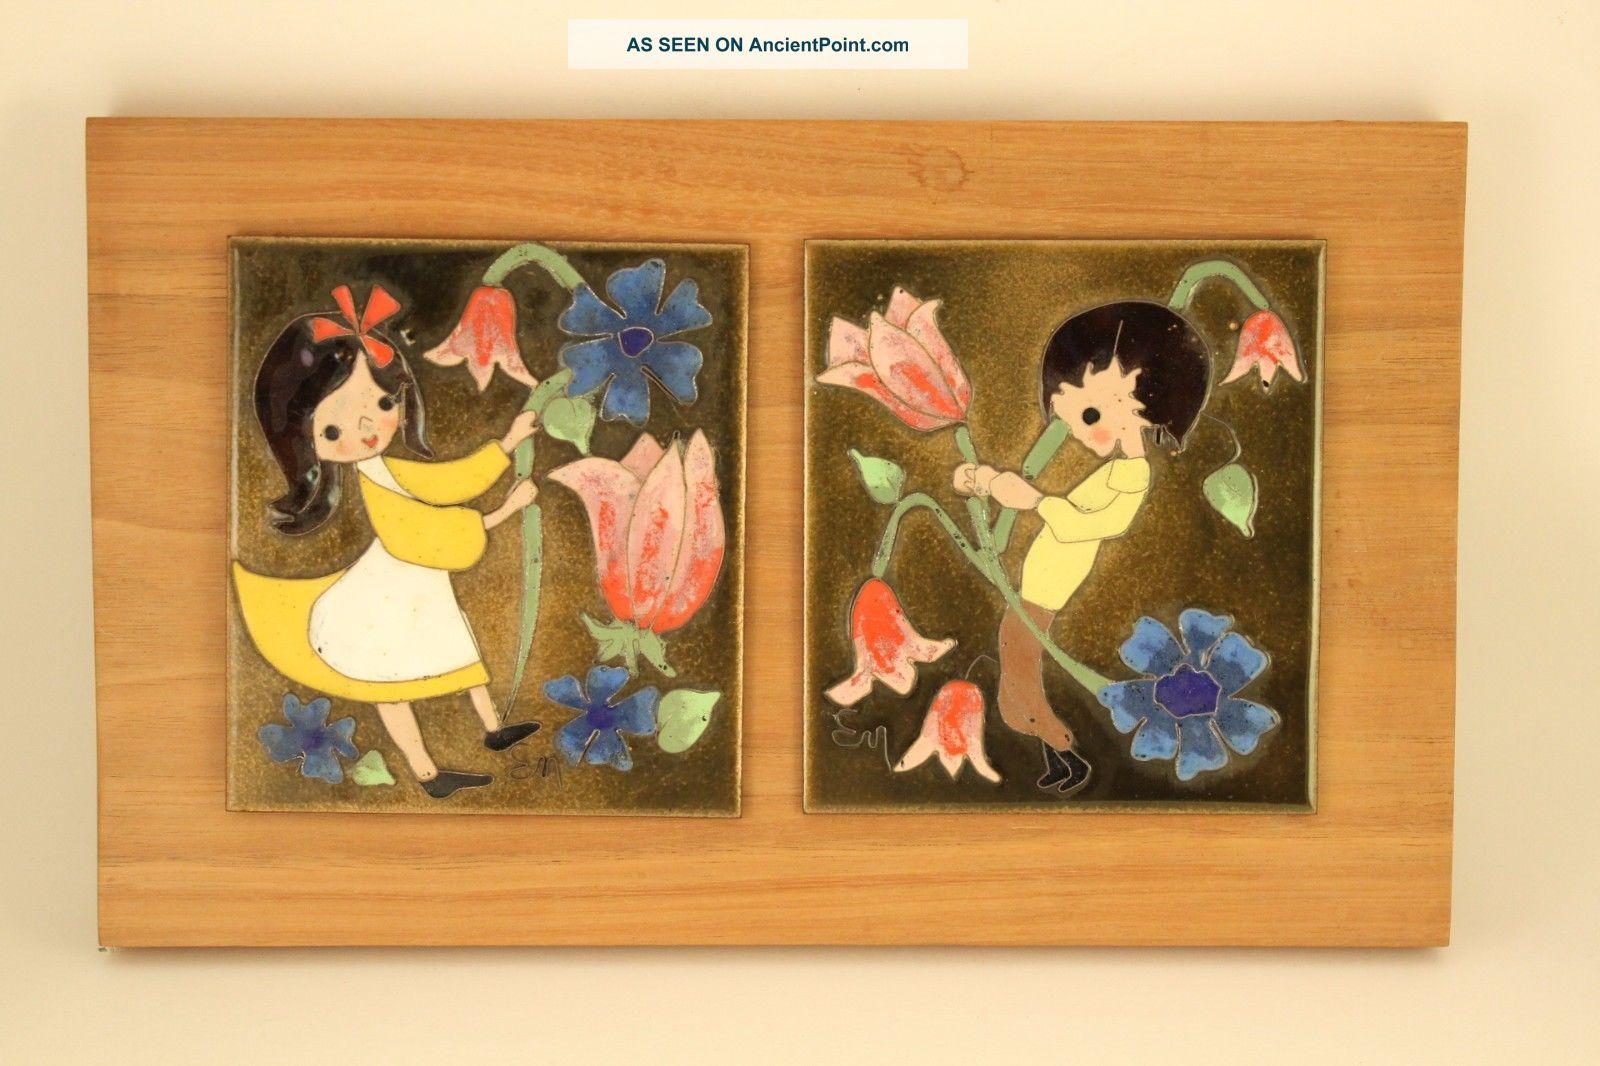 Vtg Edith Meyer Enamel Copper Cloisonne Art Twin Boy & Girl Plaque Framed Signed Mid-Century Modernism photo